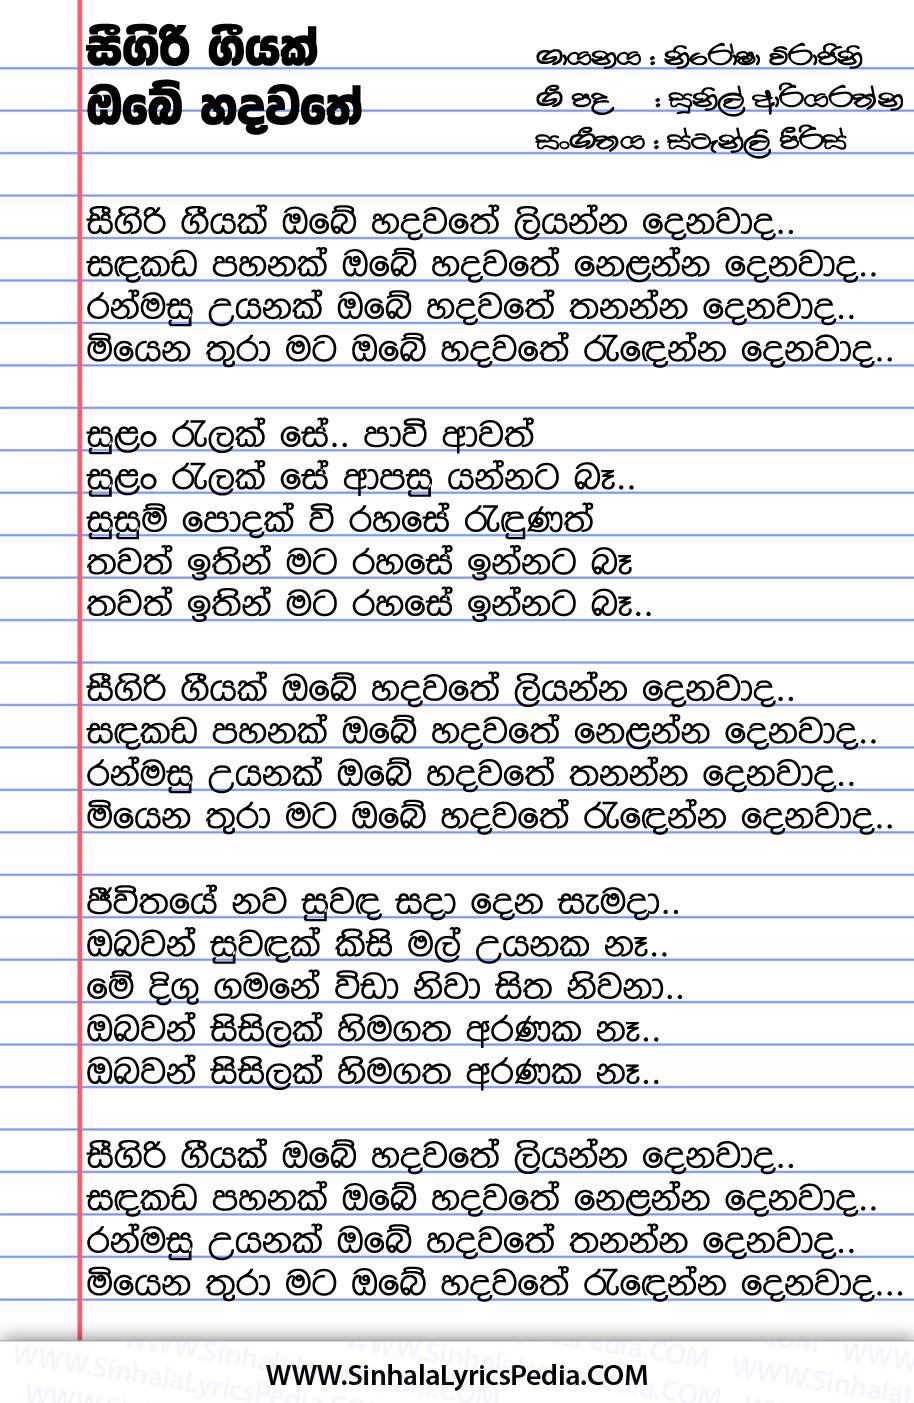 Seegiri Geeyak Obe Hadawathe Song Lyrics